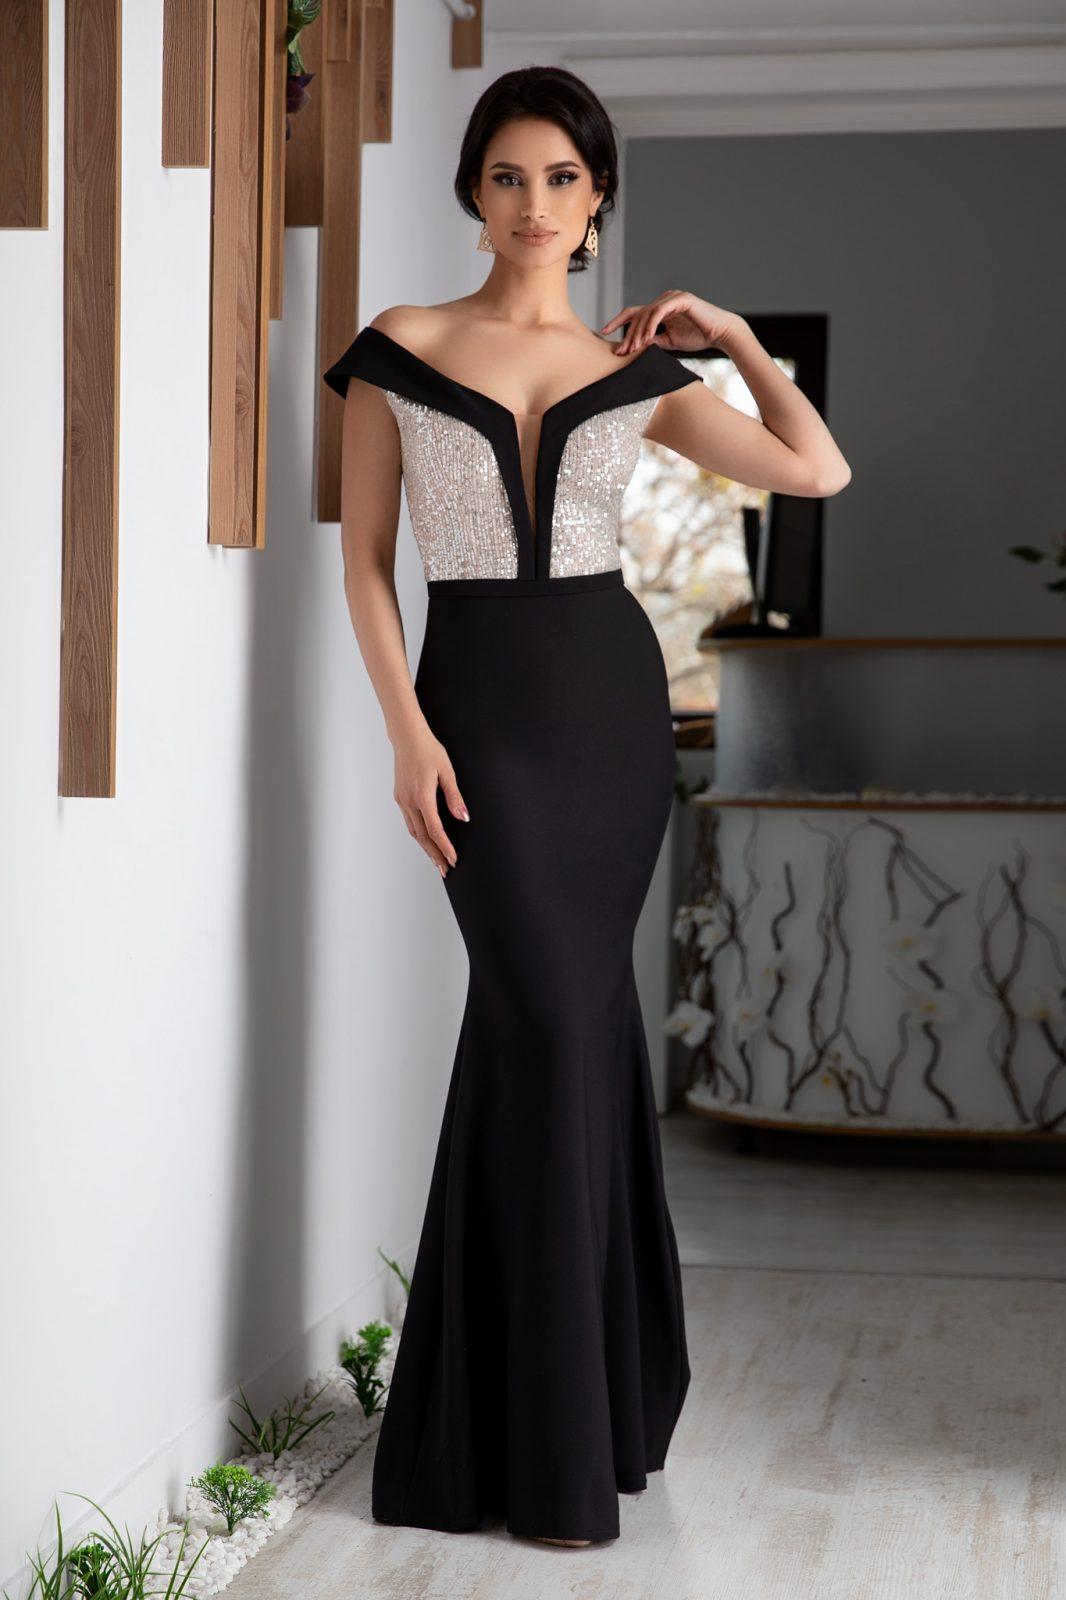 Leah Black Dress